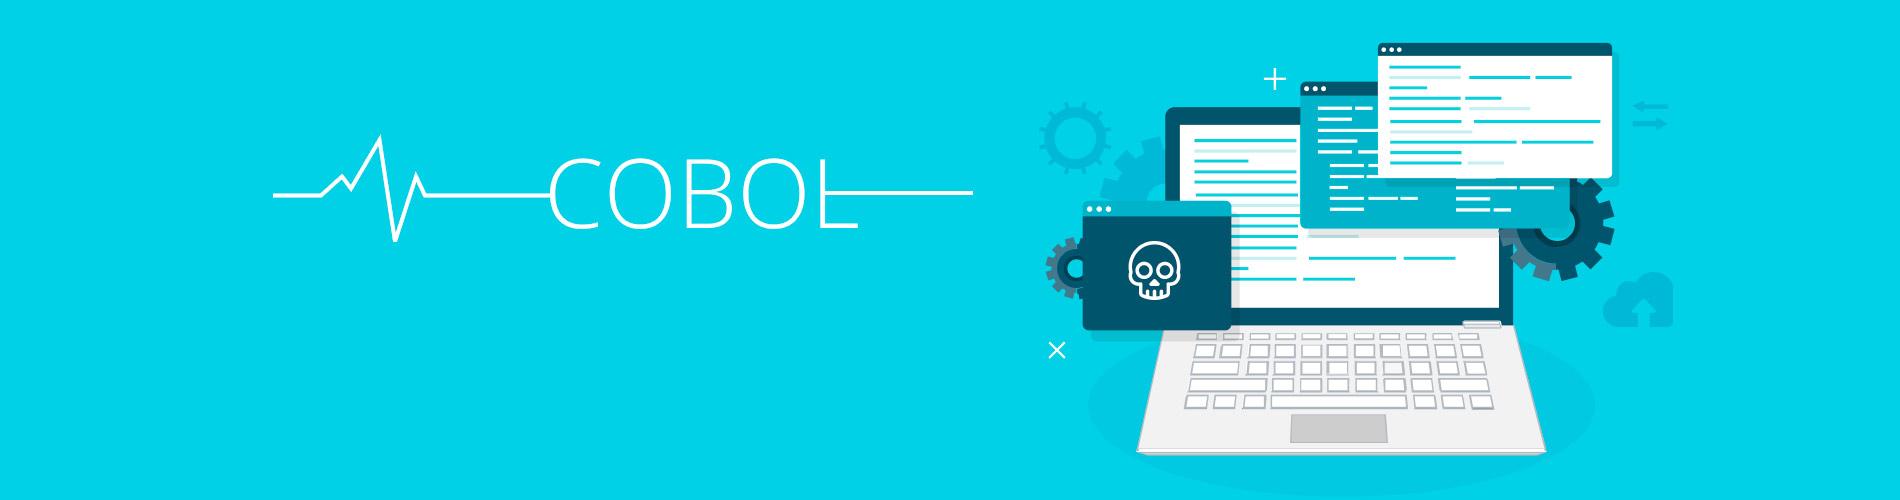 cobol software